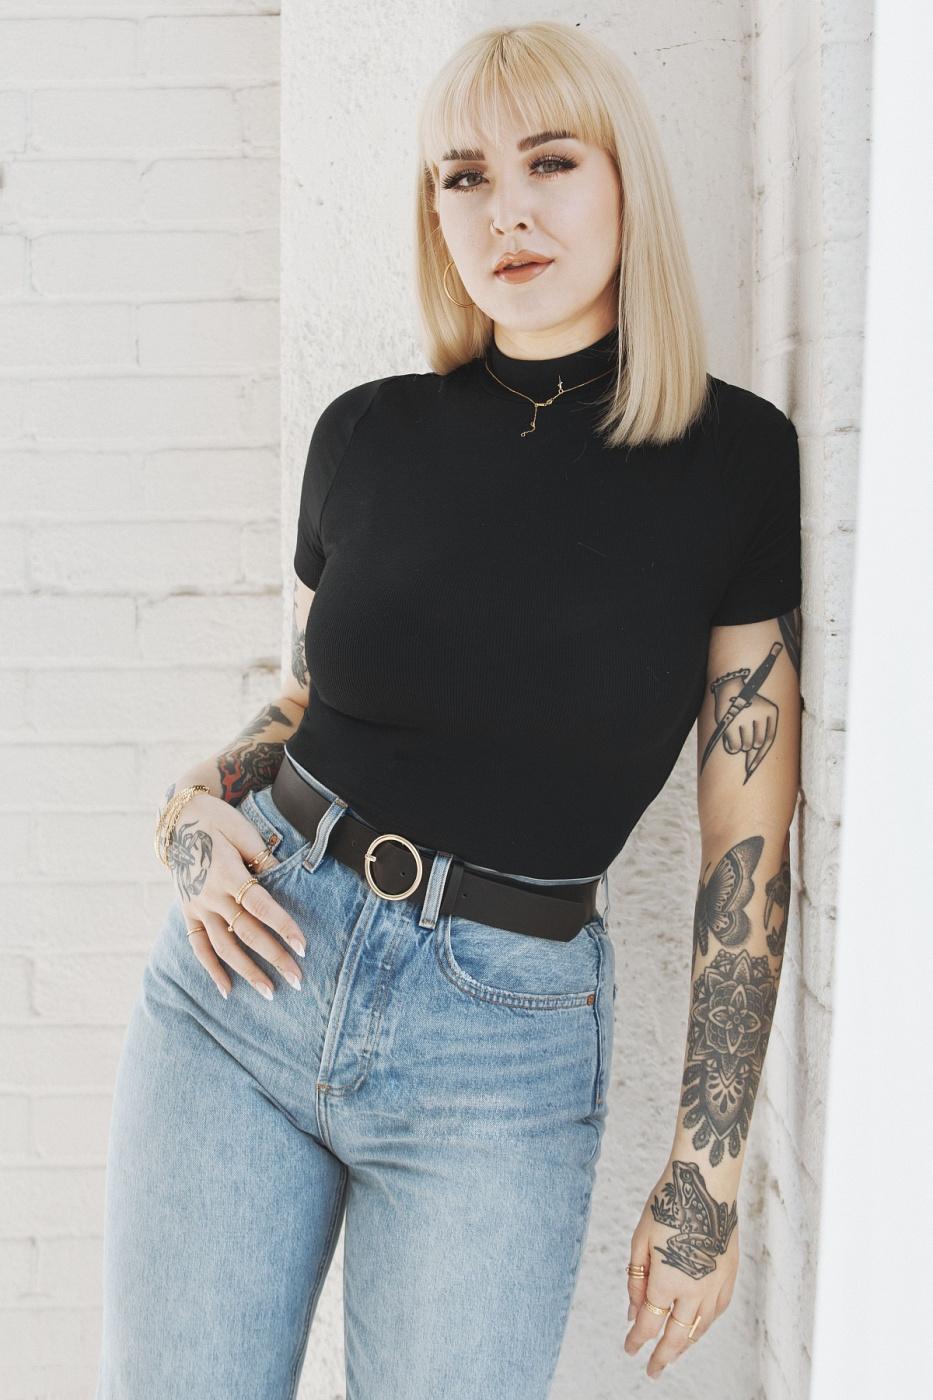 Isabella Bloom